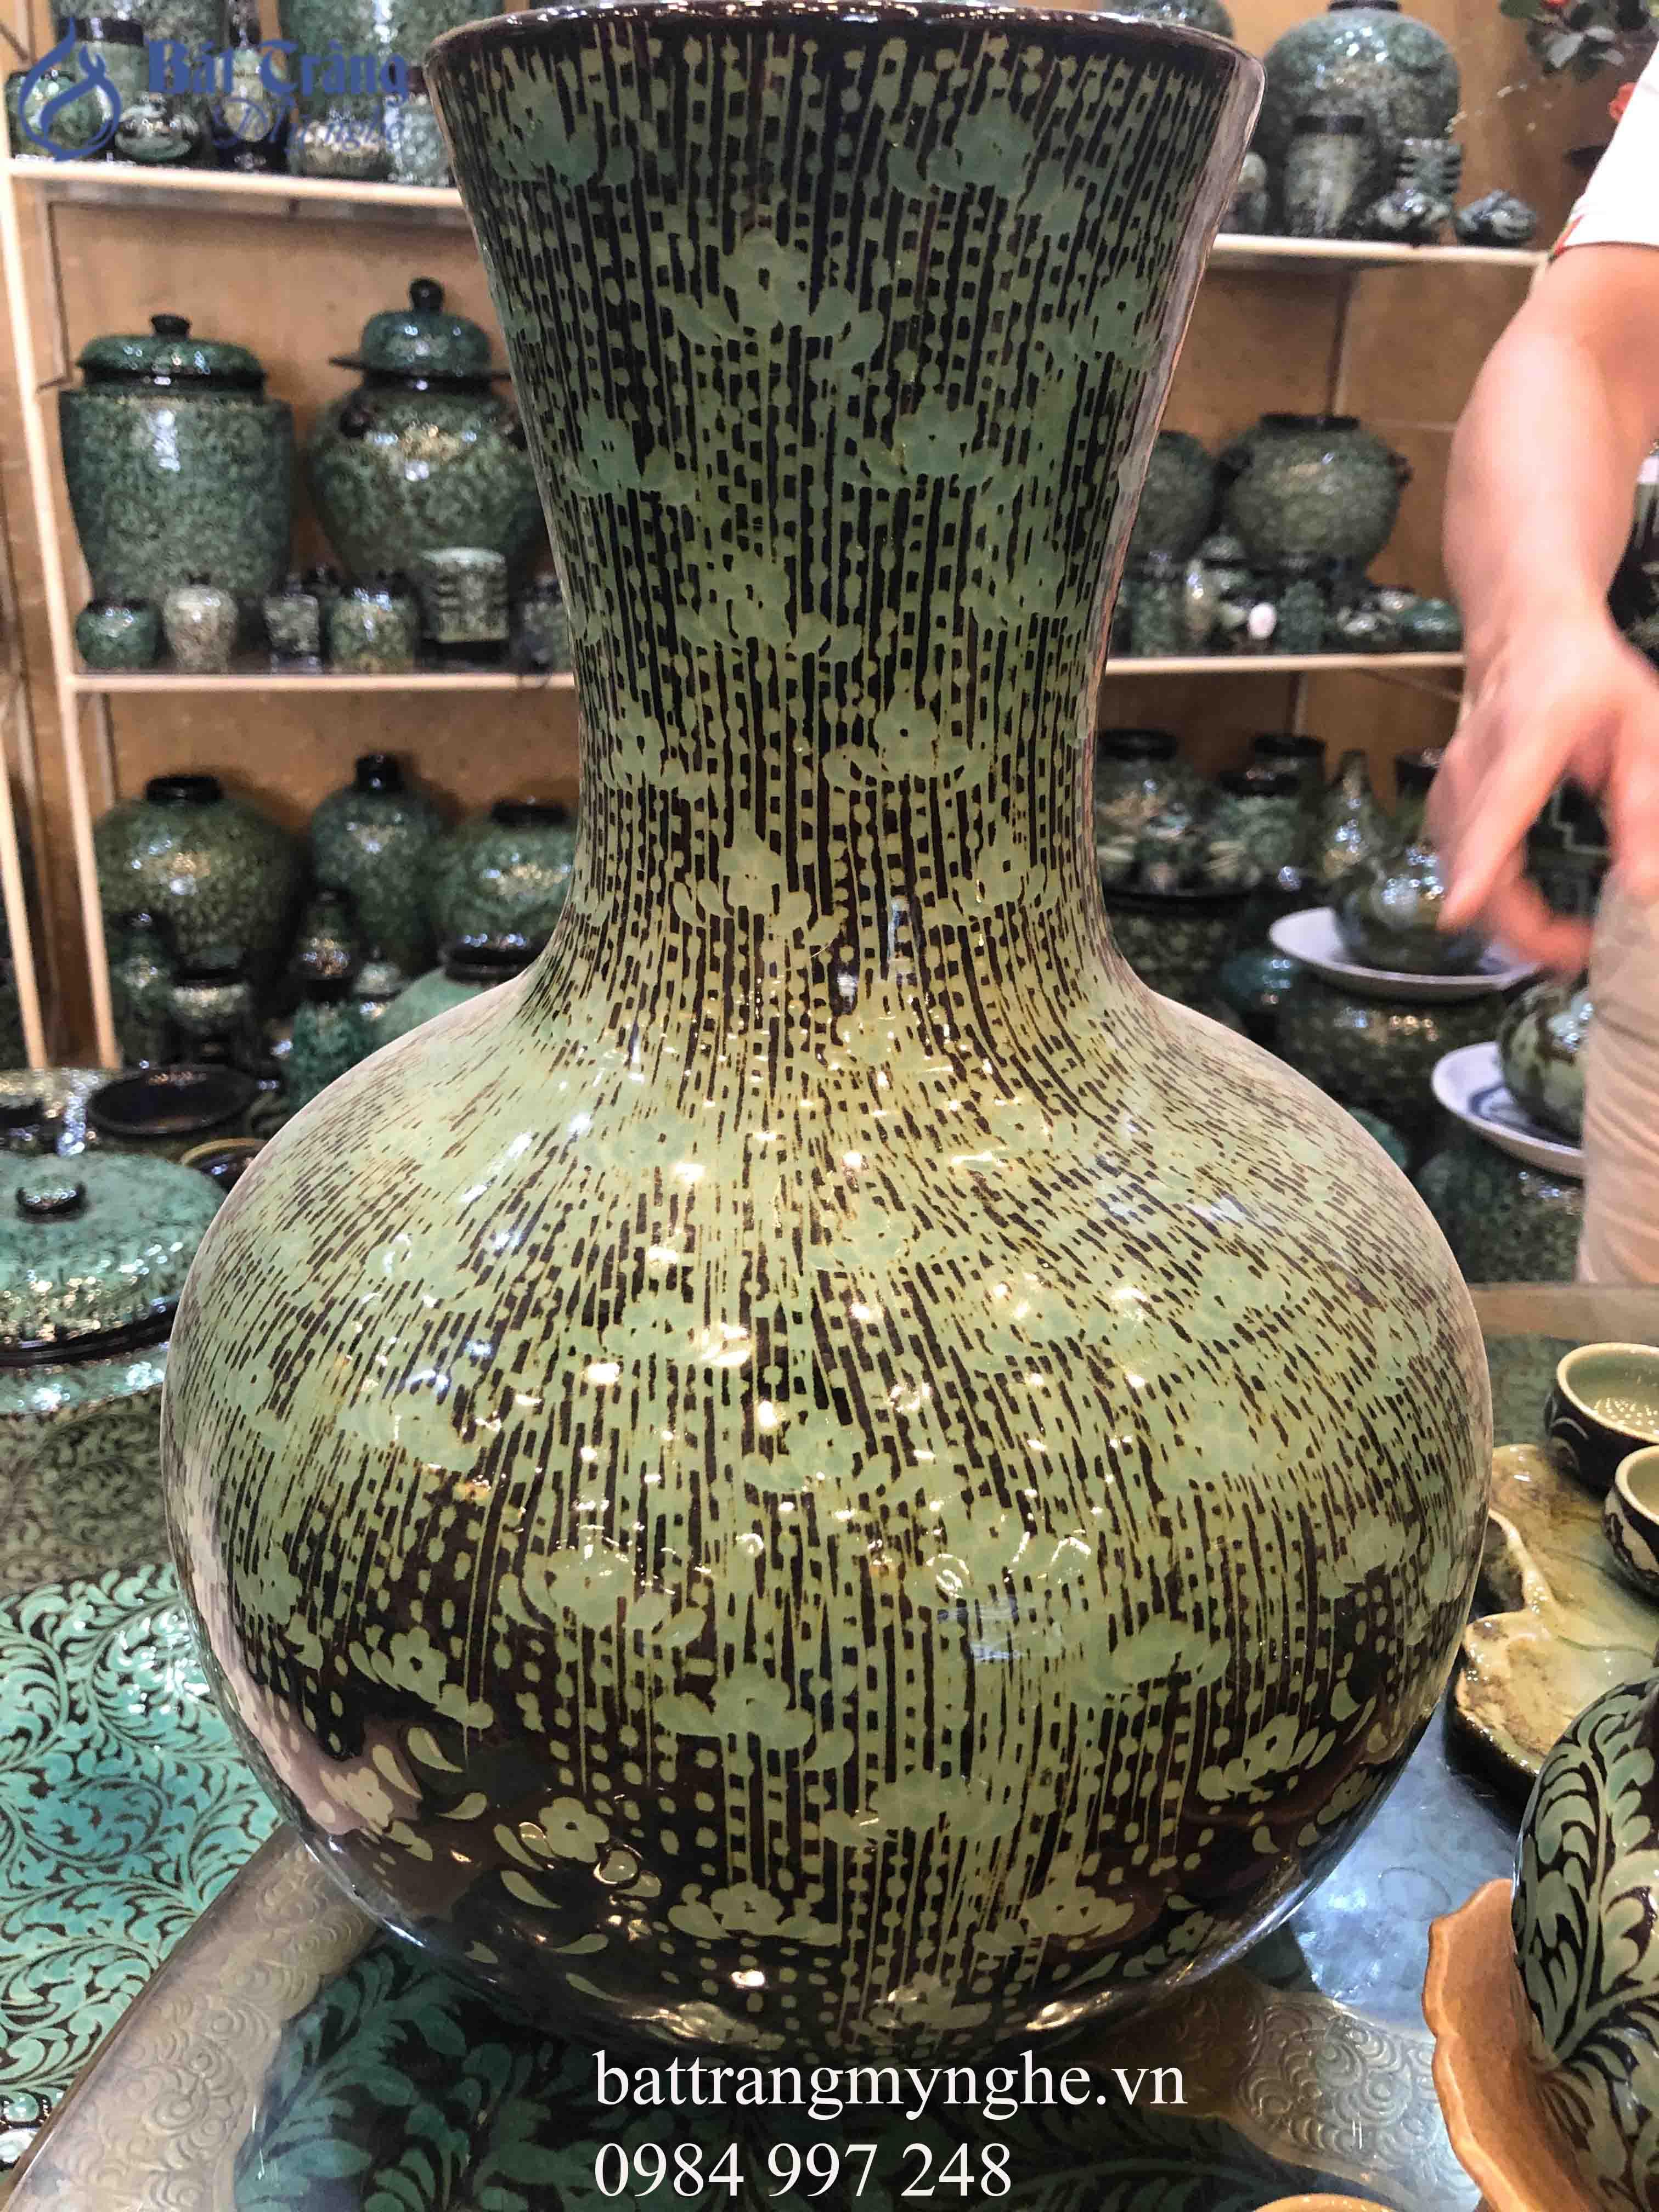 Lọ hoa khắc hoa men xanh ngọc cao 45cm